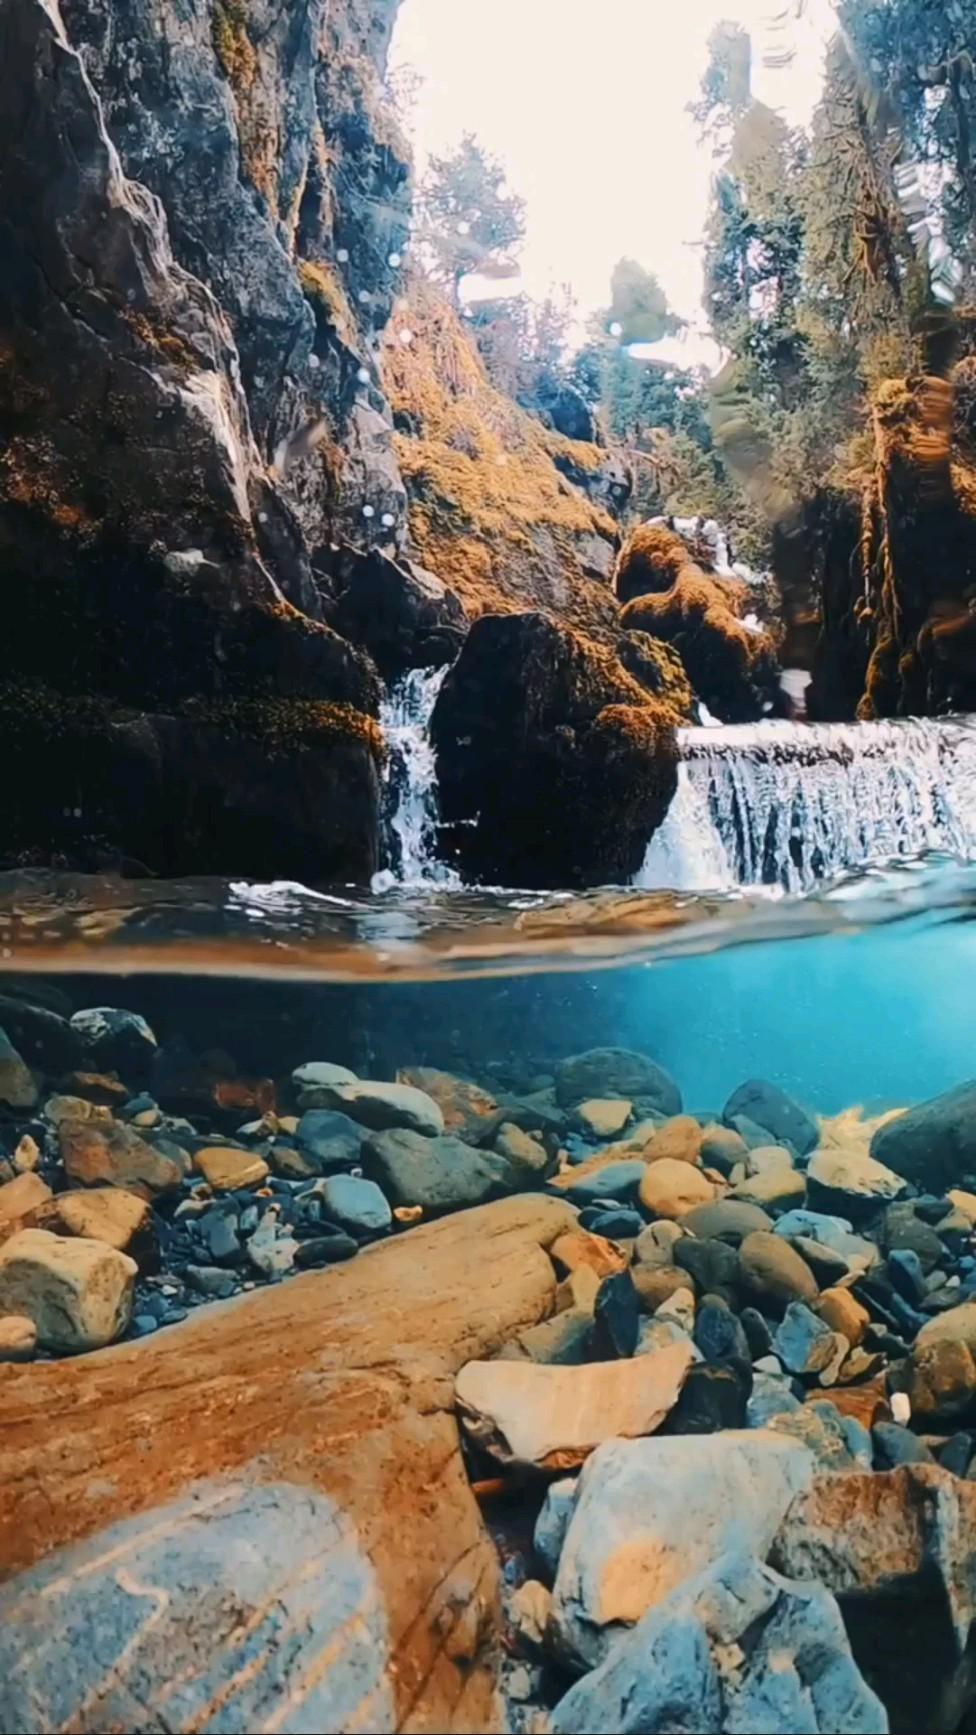 Clean water 💦